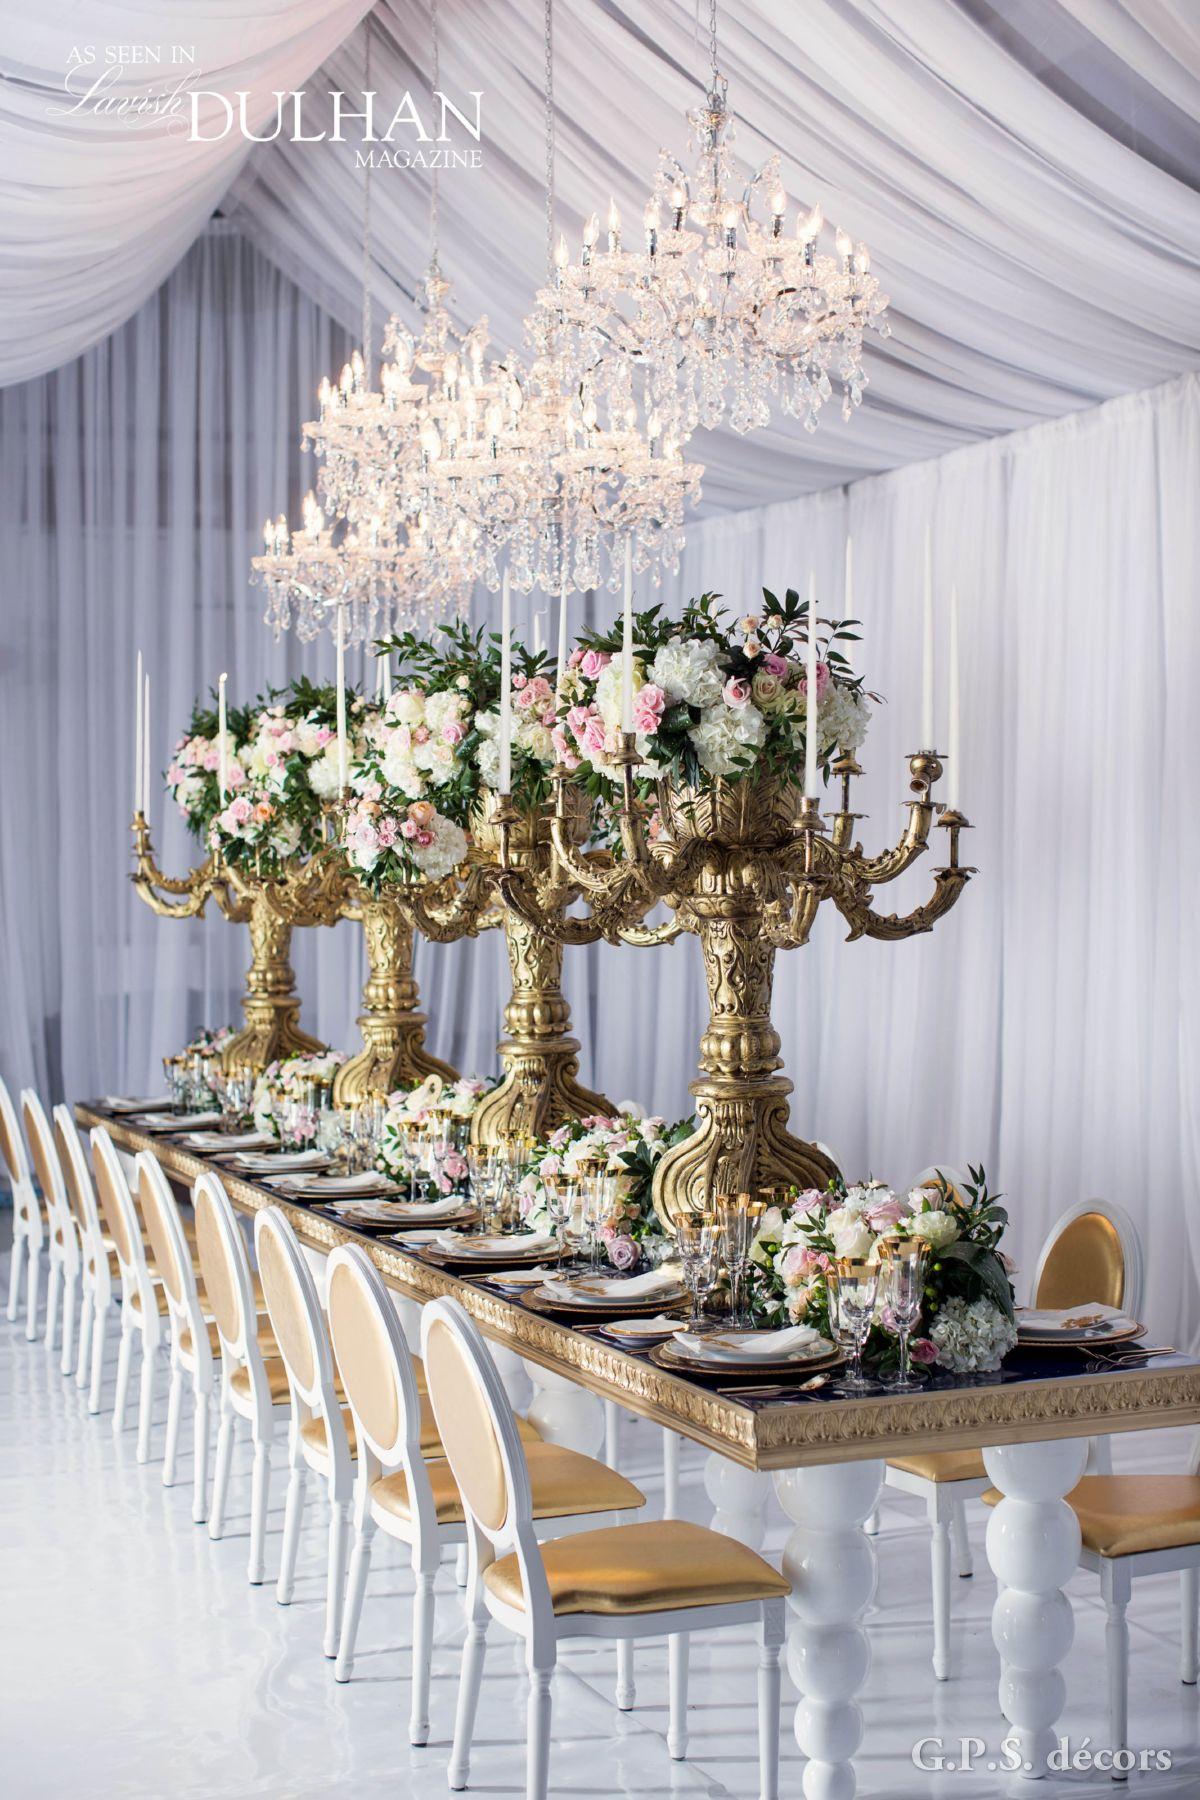 Wedding decorators toronto gps decors wedding decorators mississauga wedding decorators brampton wedding decorators vaughan wedding decorators scarbrough junglespirit Gallery